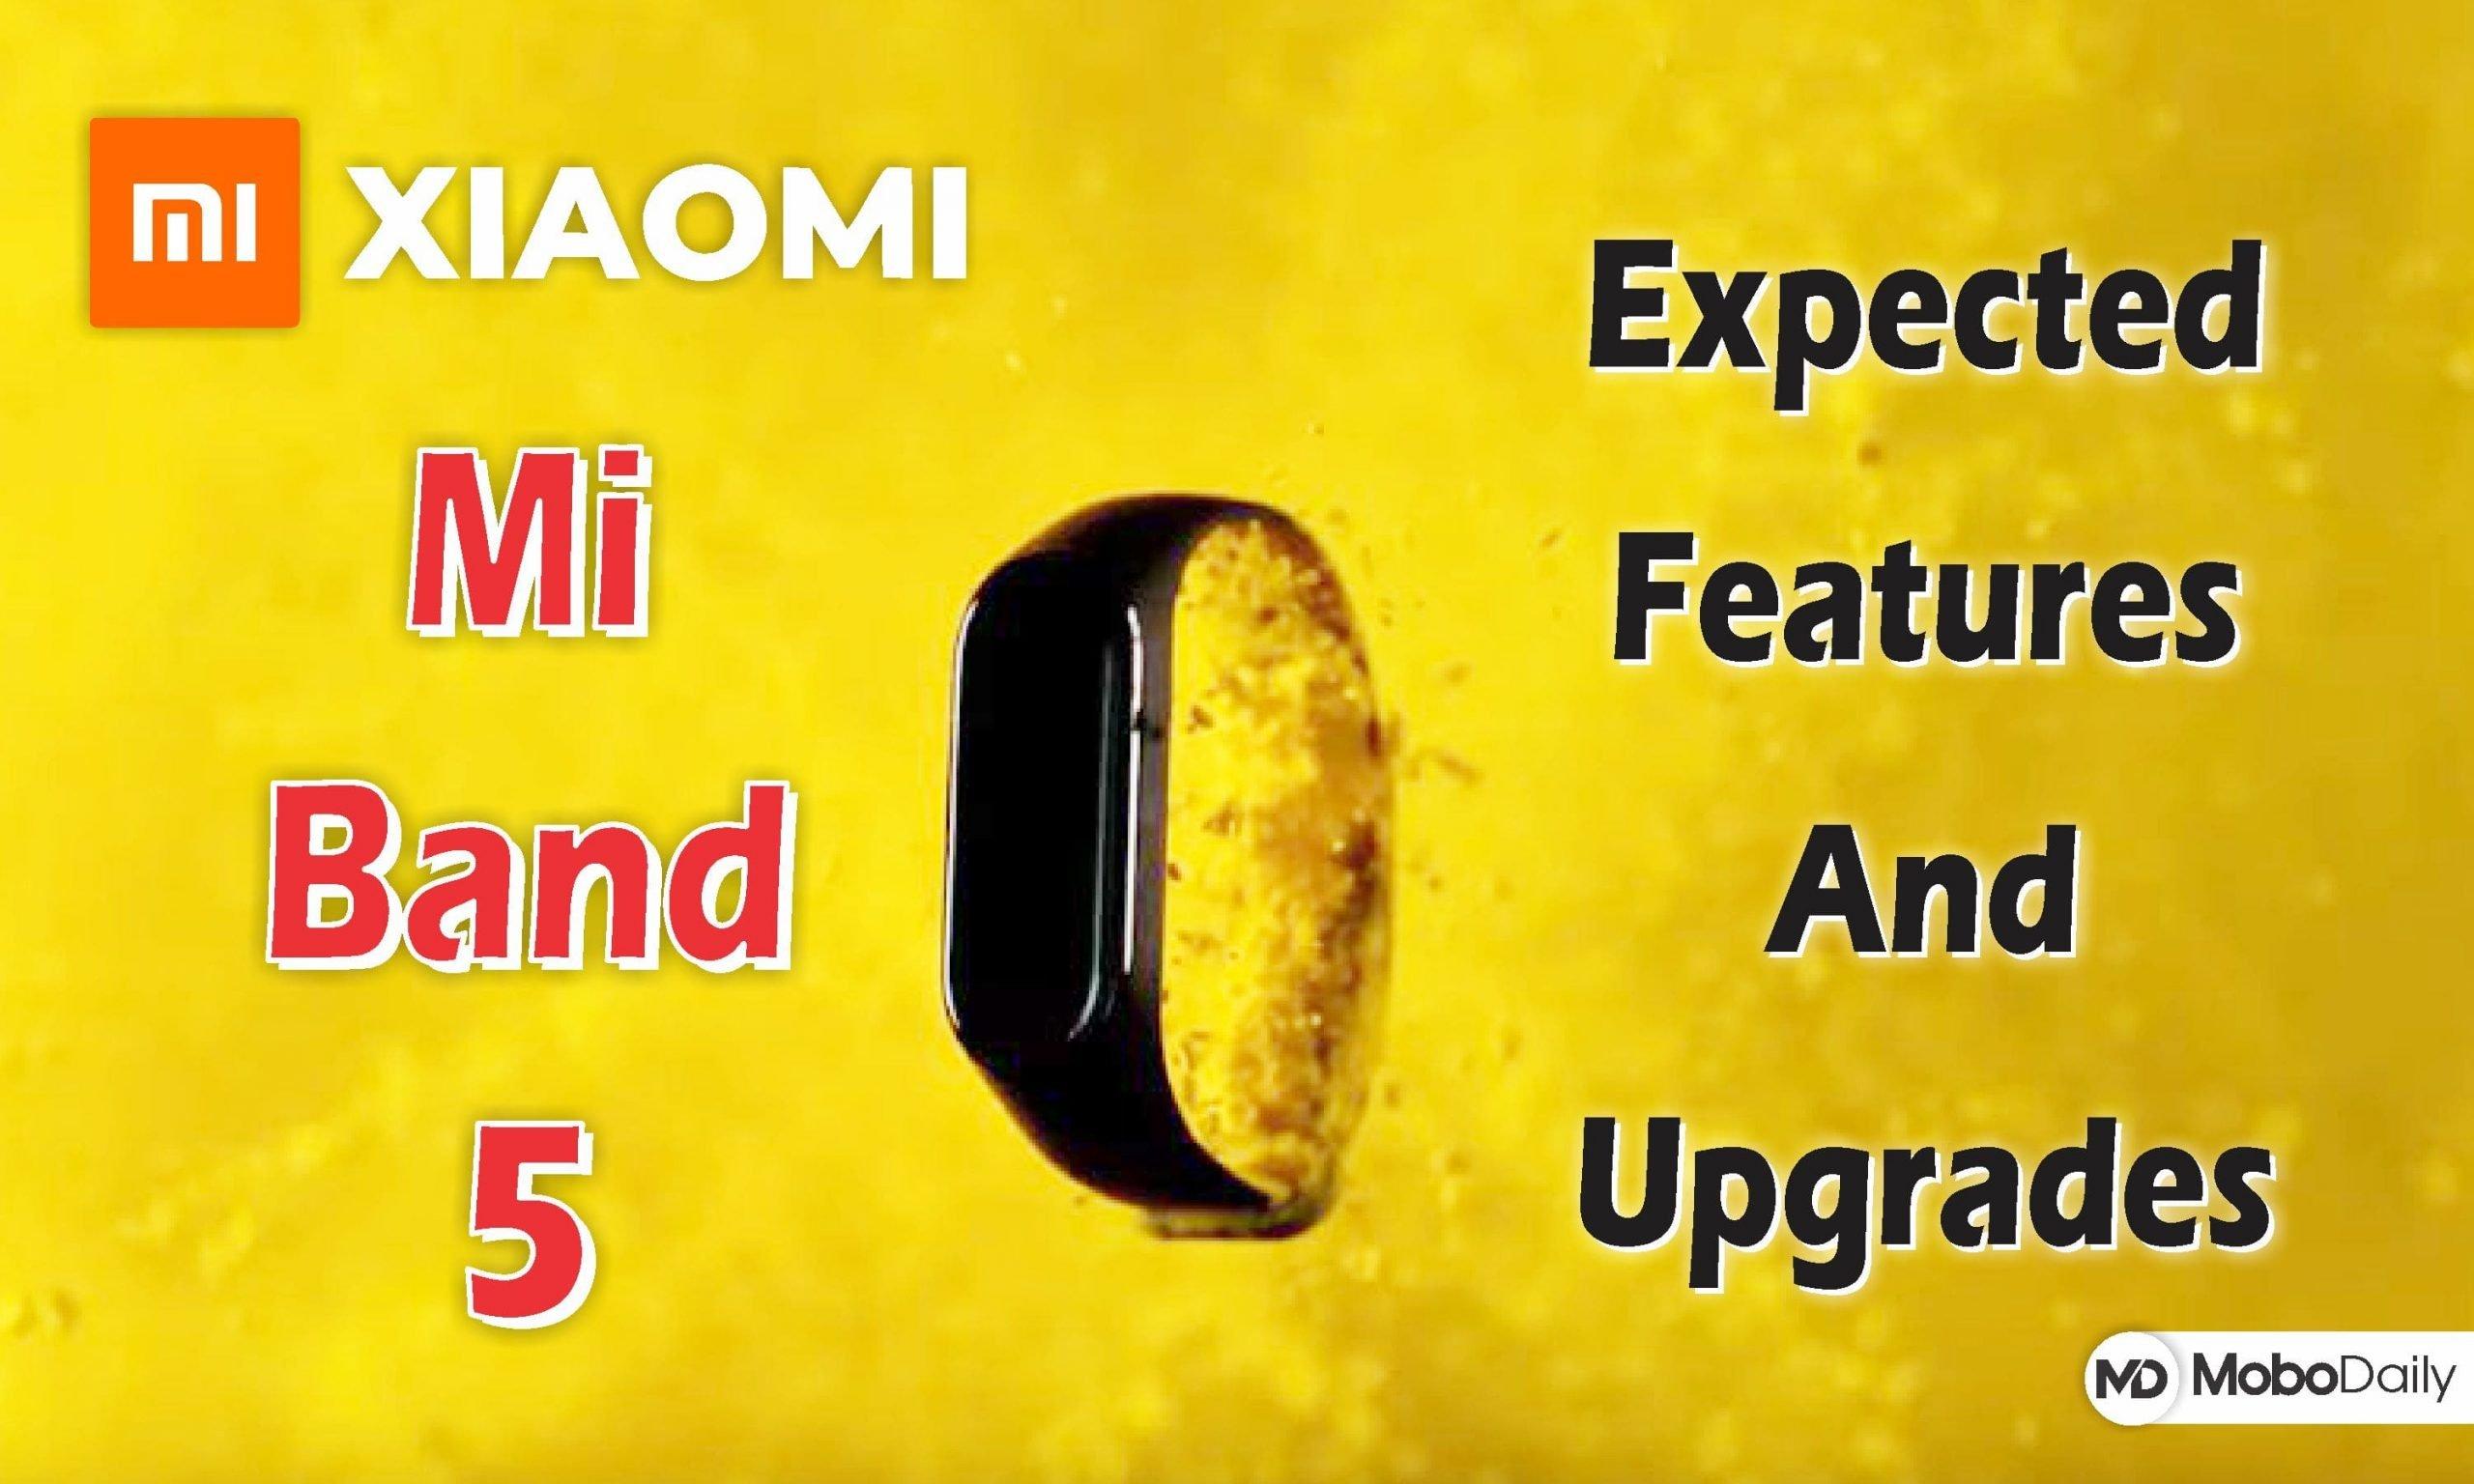 Xiaomi Mi Band 5 - MoboDaily